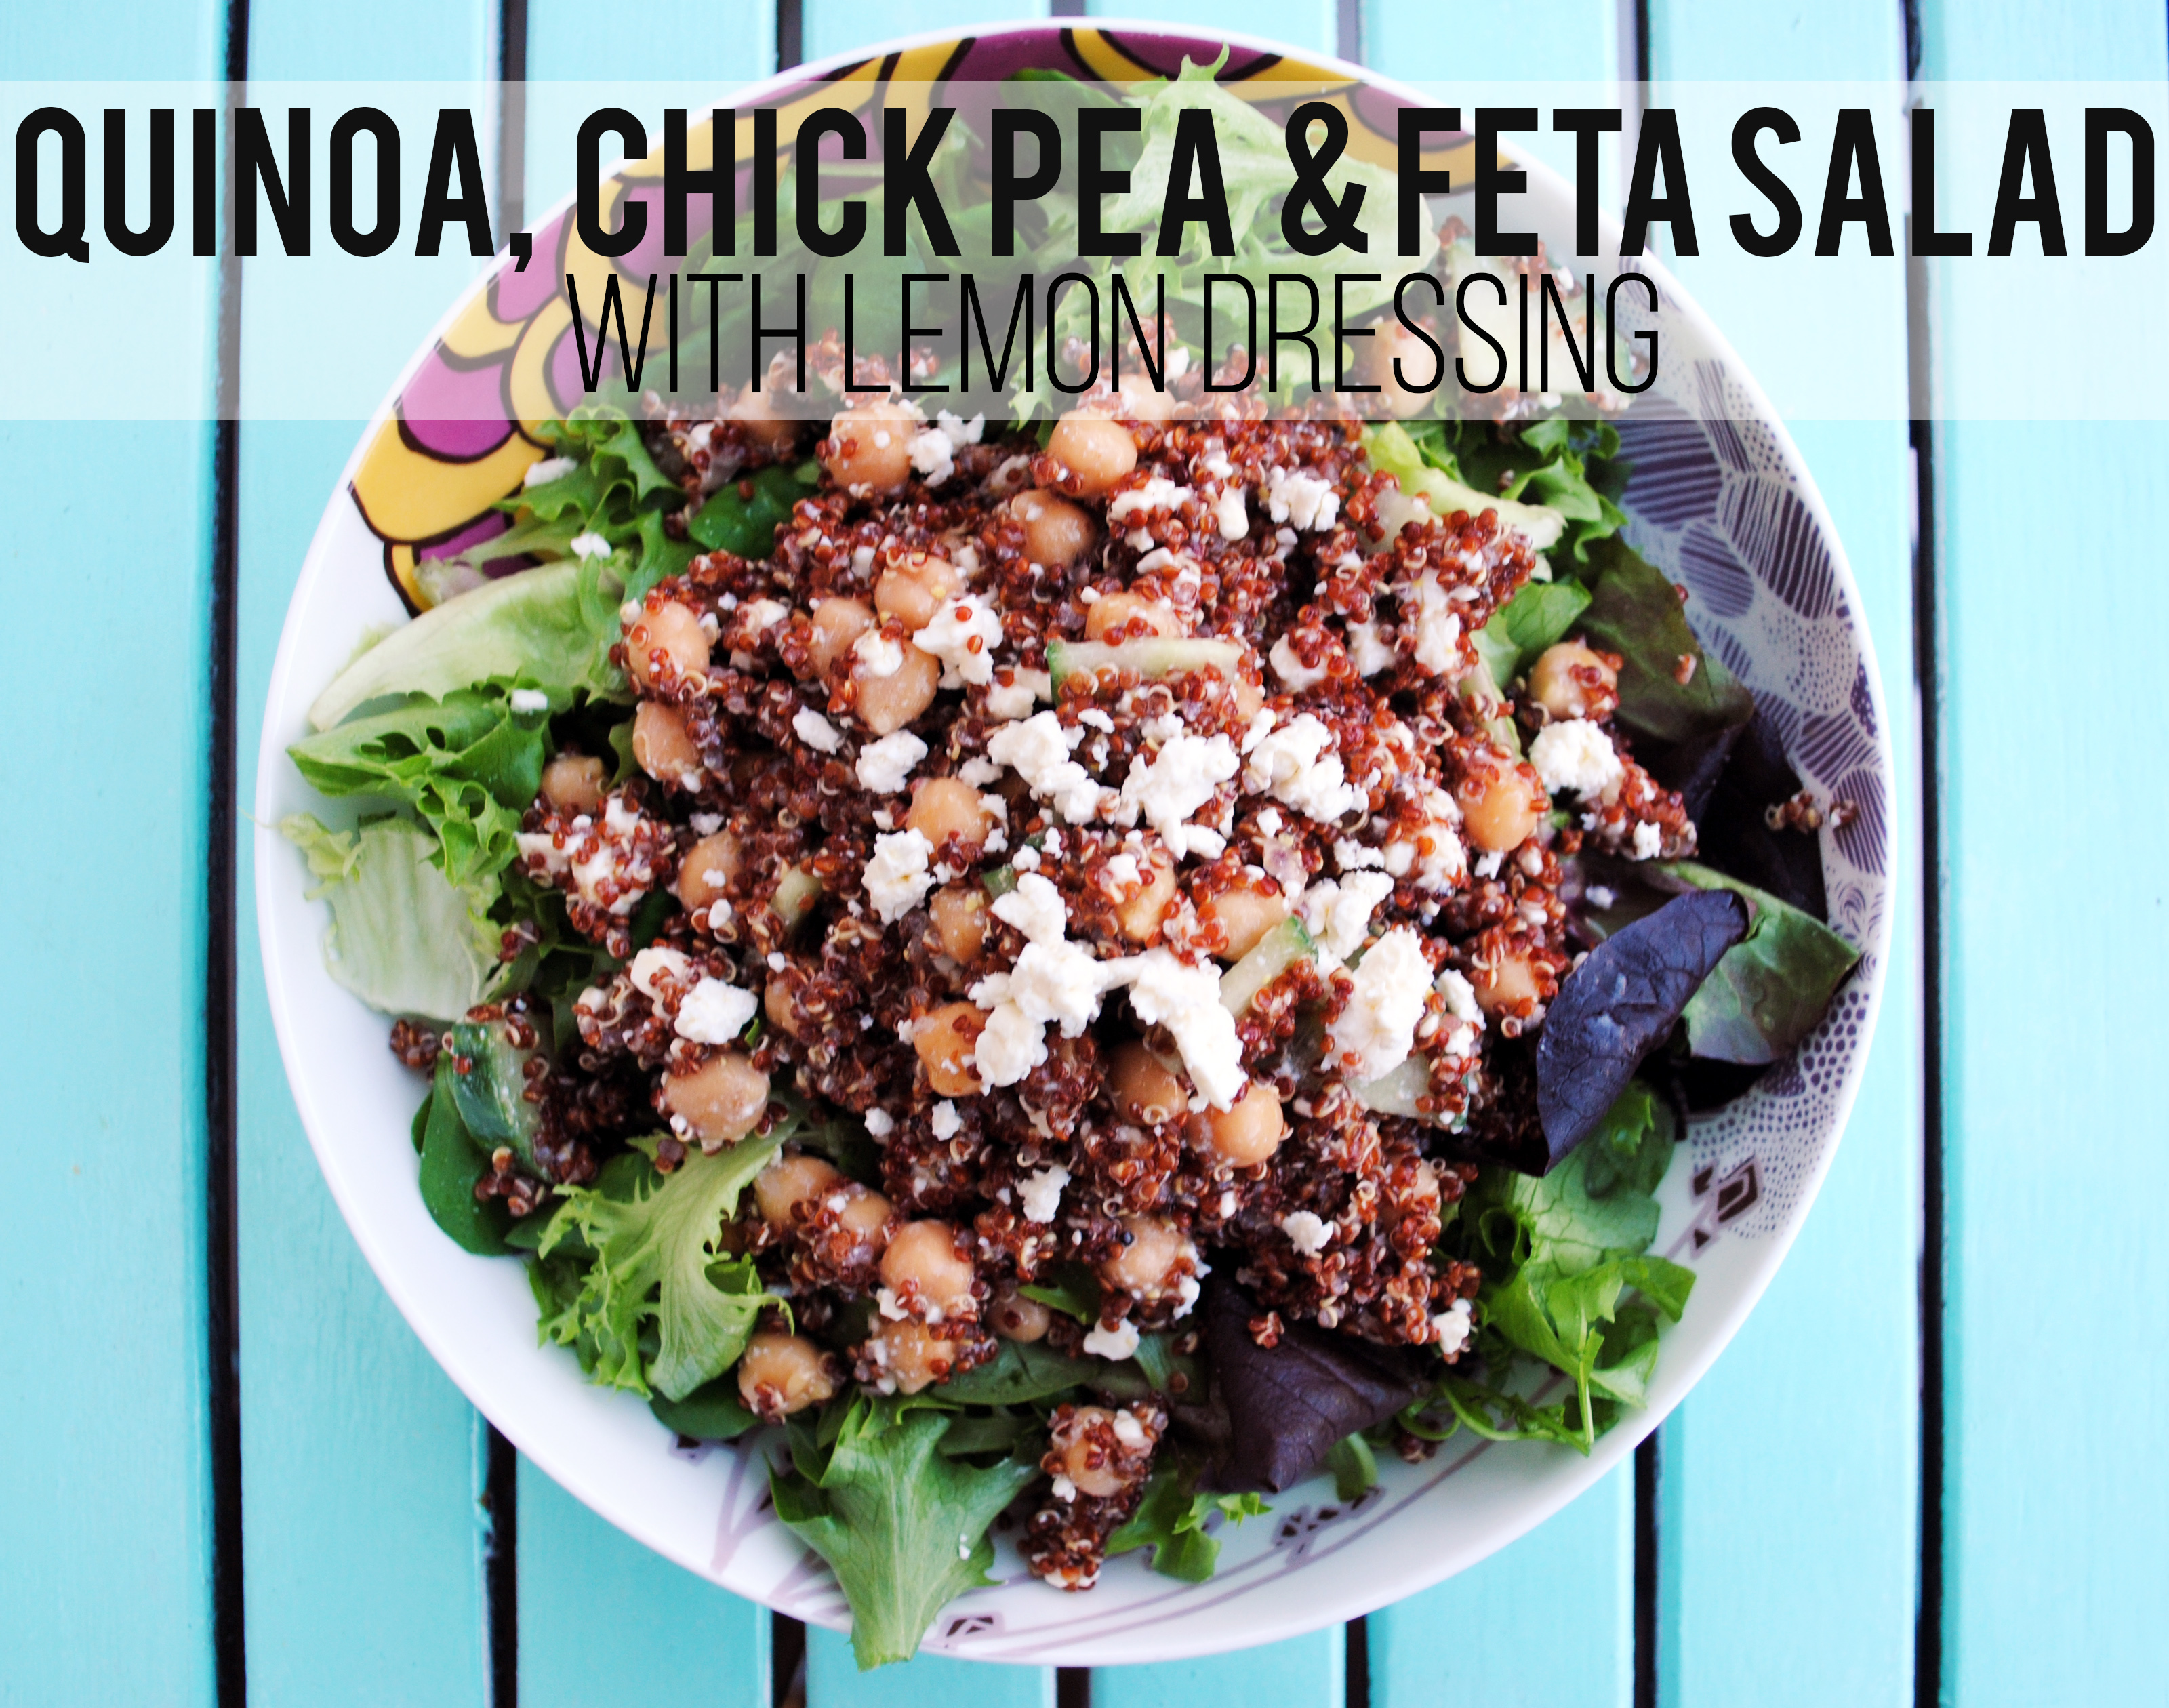 Tangerine Canteen Summer Salads - Quinoa, Chick Pea & Feta